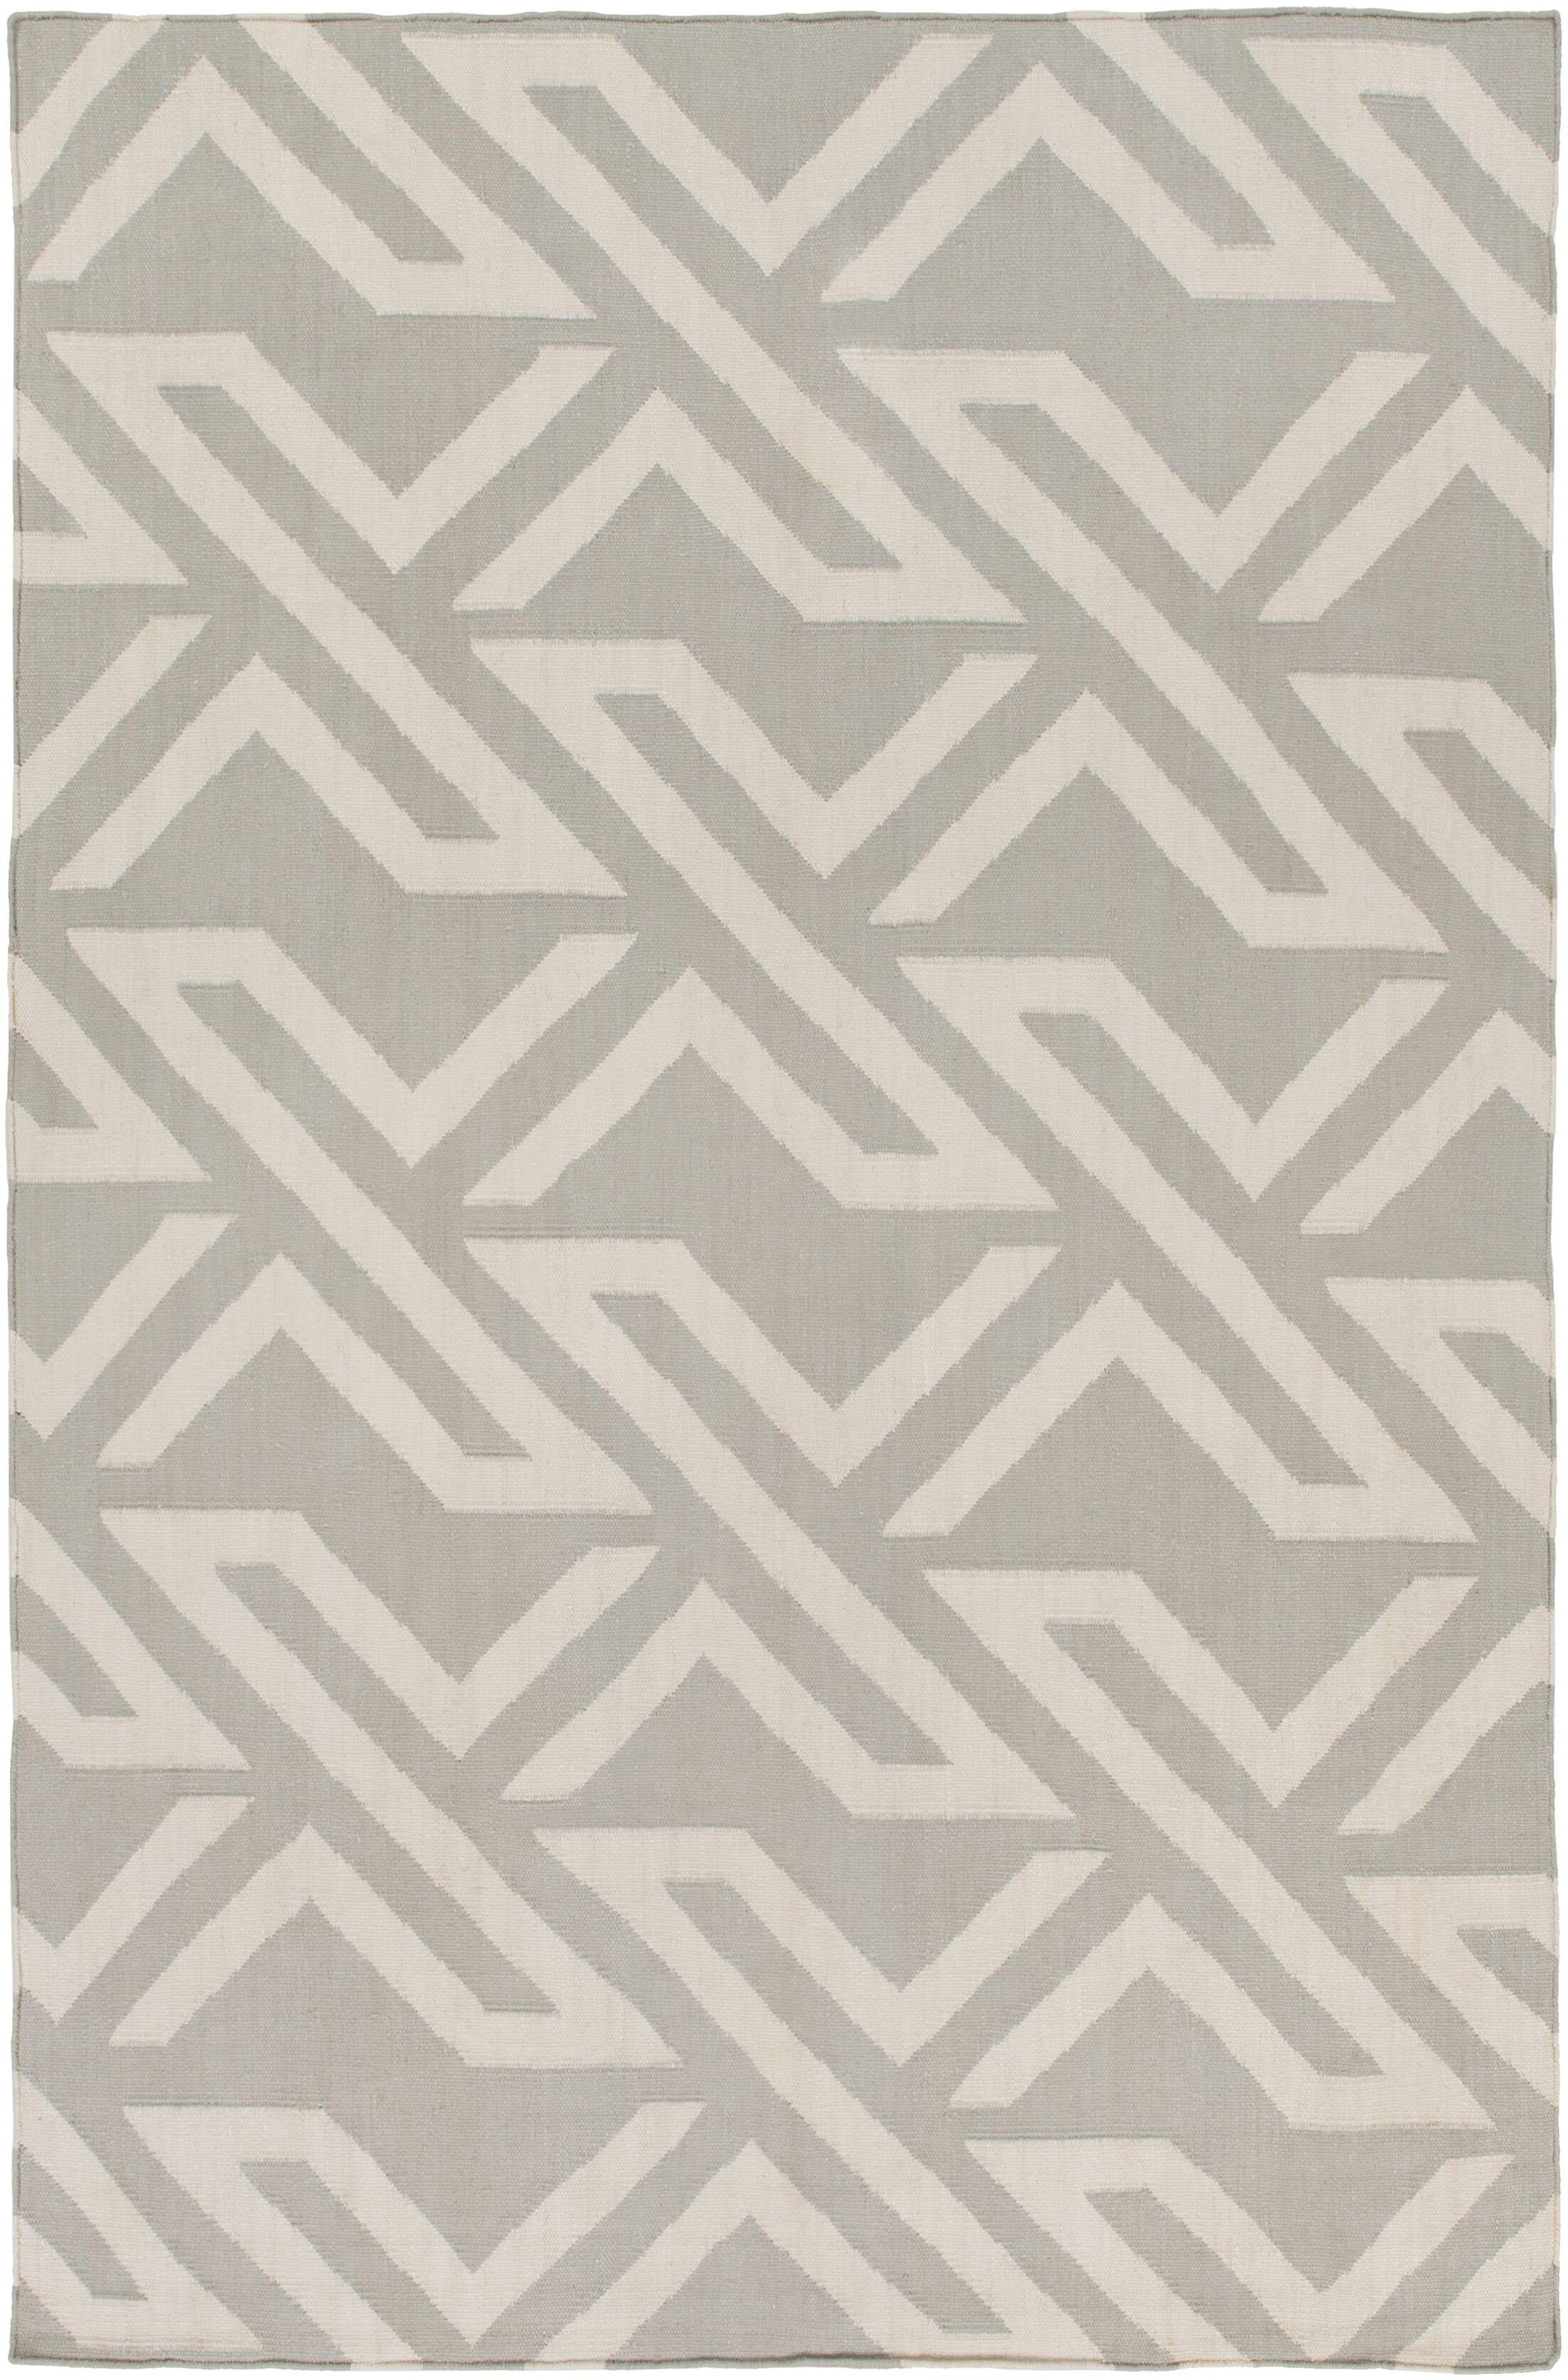 Breece Light Gray/Ivory Area Rug Rug Size: Rectangle 8' x 10'